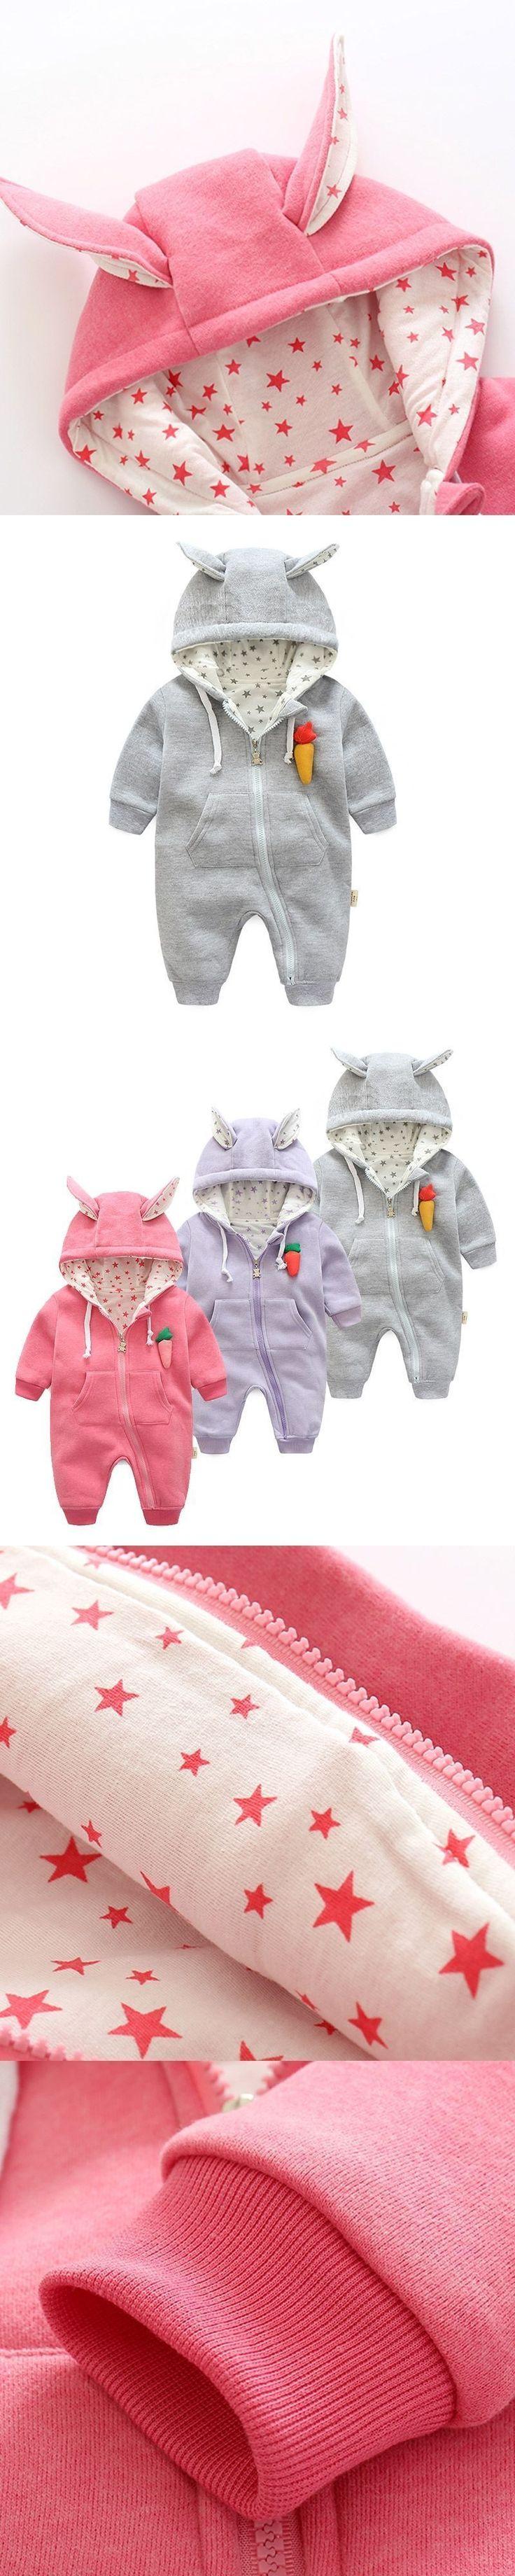 2017 autumn spring infant girl costumes cute Carrot hoodies for girls  outerwear & coats , 0-24M Baby Girls clothes Newborn wear #babygirlhoodies #babygirlcoats